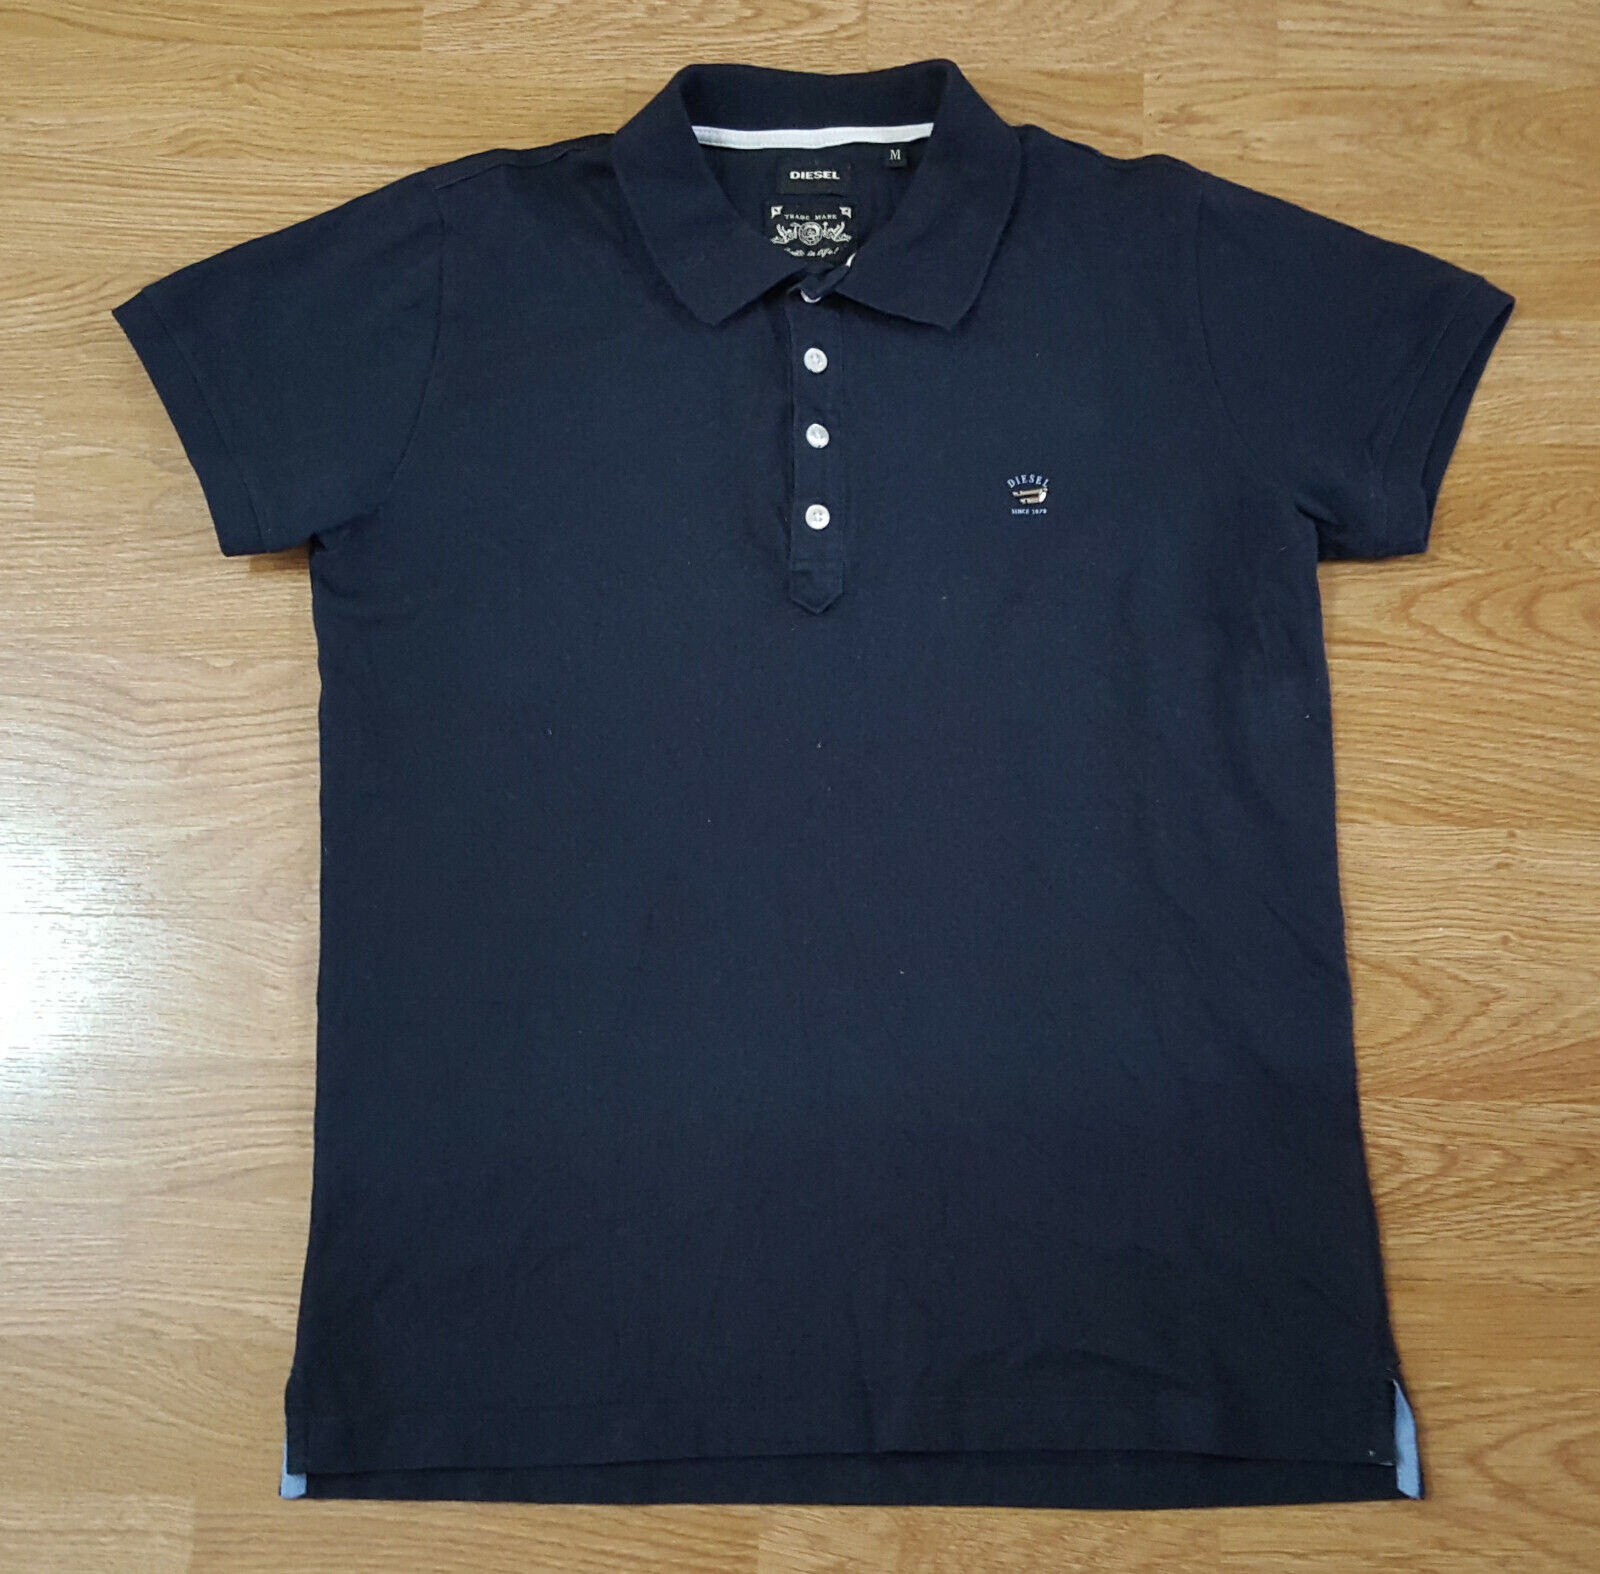 Diesel Polo T Shirt Top Short Sleeves Ladies schwarz Größe M